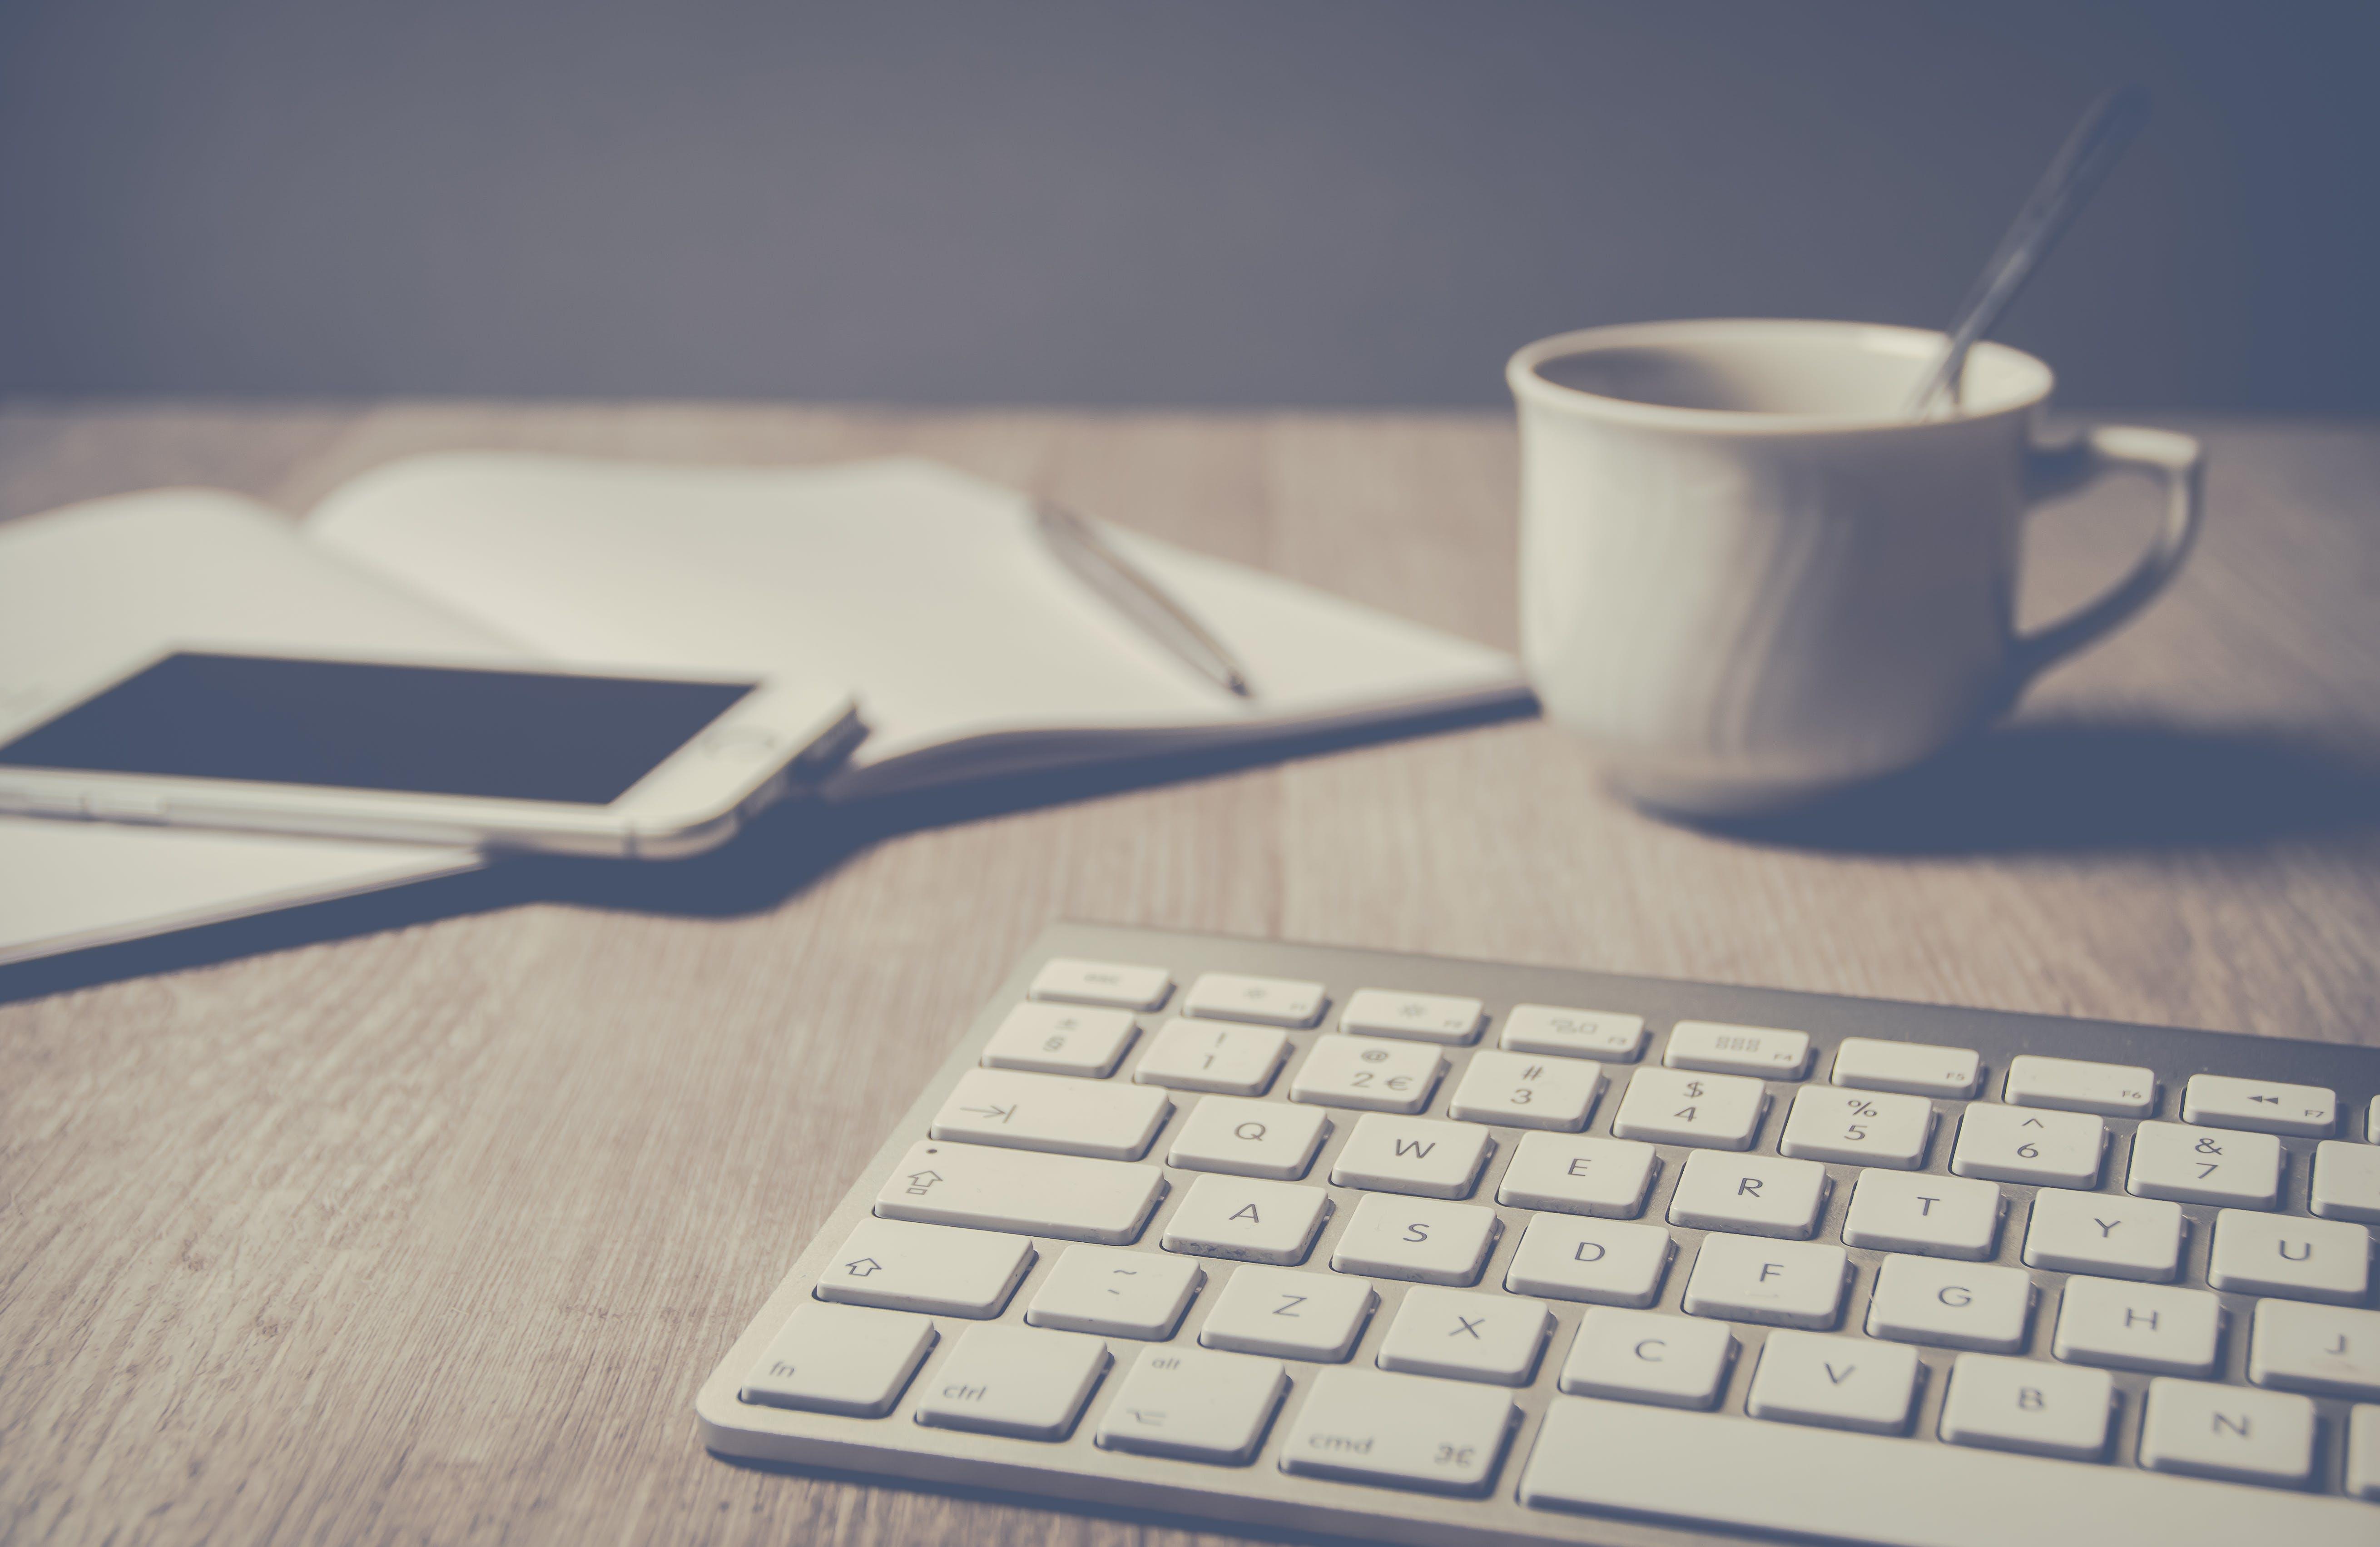 Magic Keyboard Beside Coffee Mug on Desk